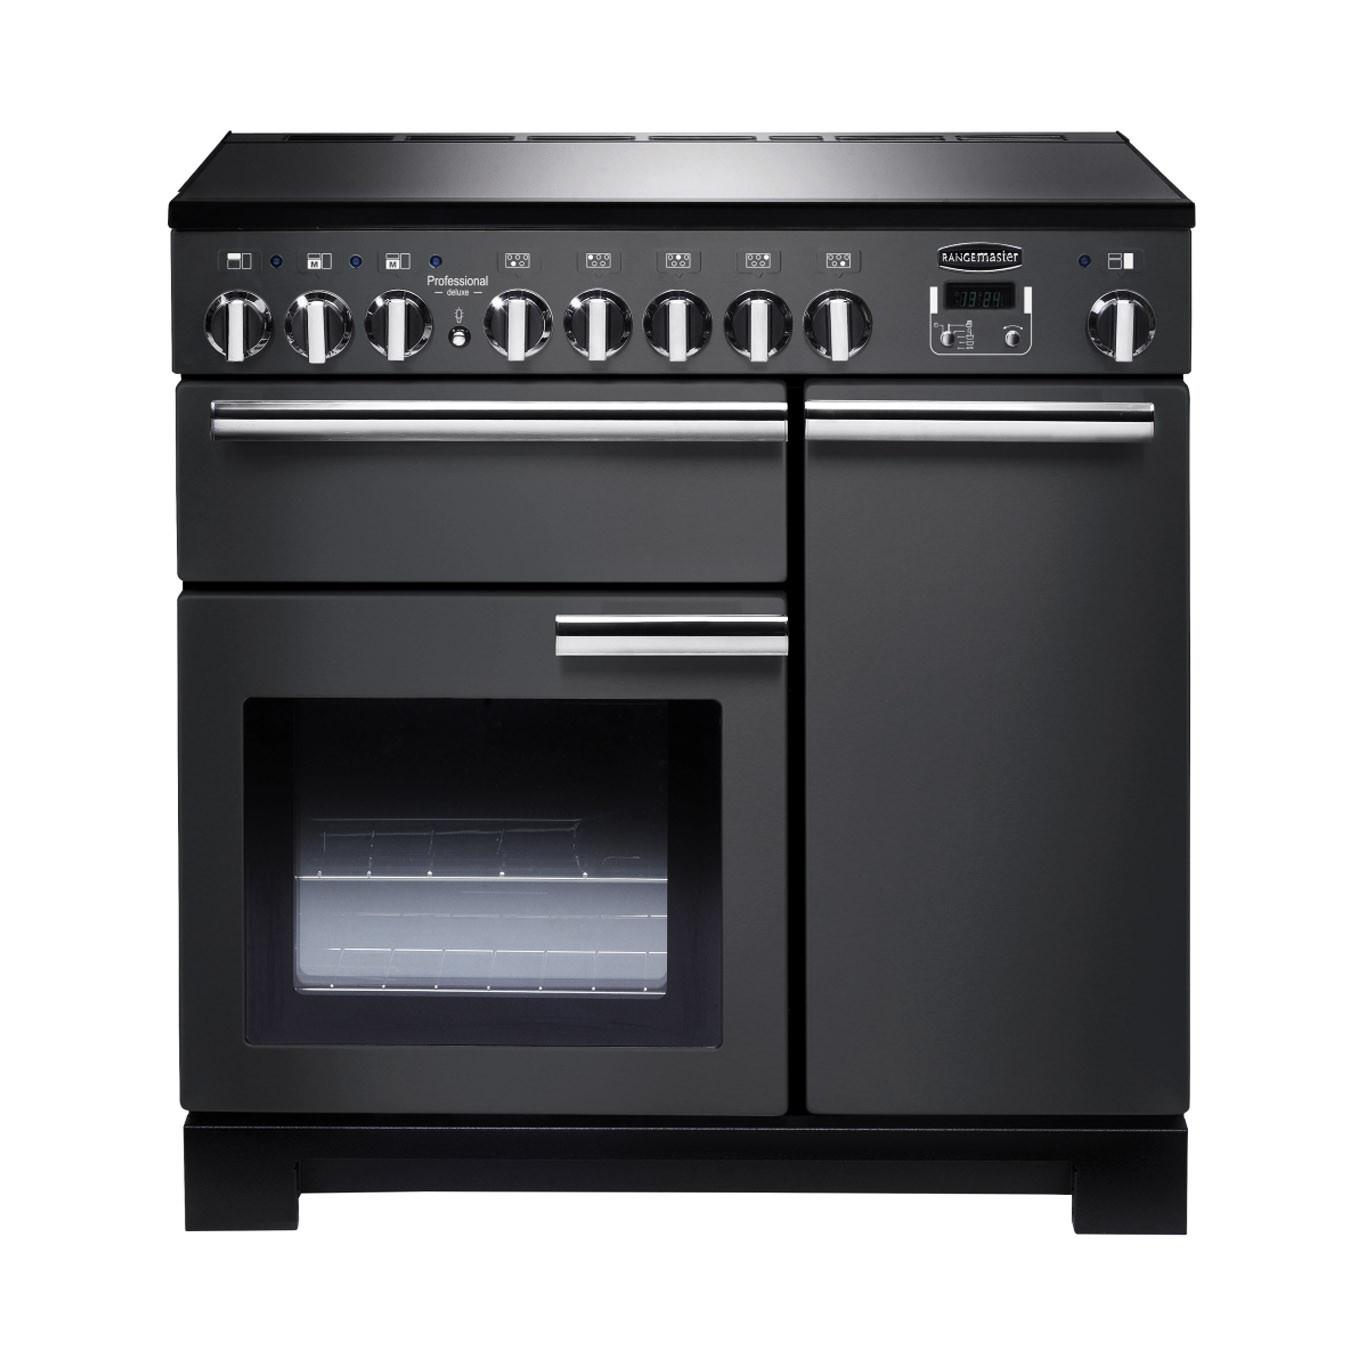 Rangemaster Professional Deluxe 90 Induction Slate Range Cooker PDL90EISL/C 105970